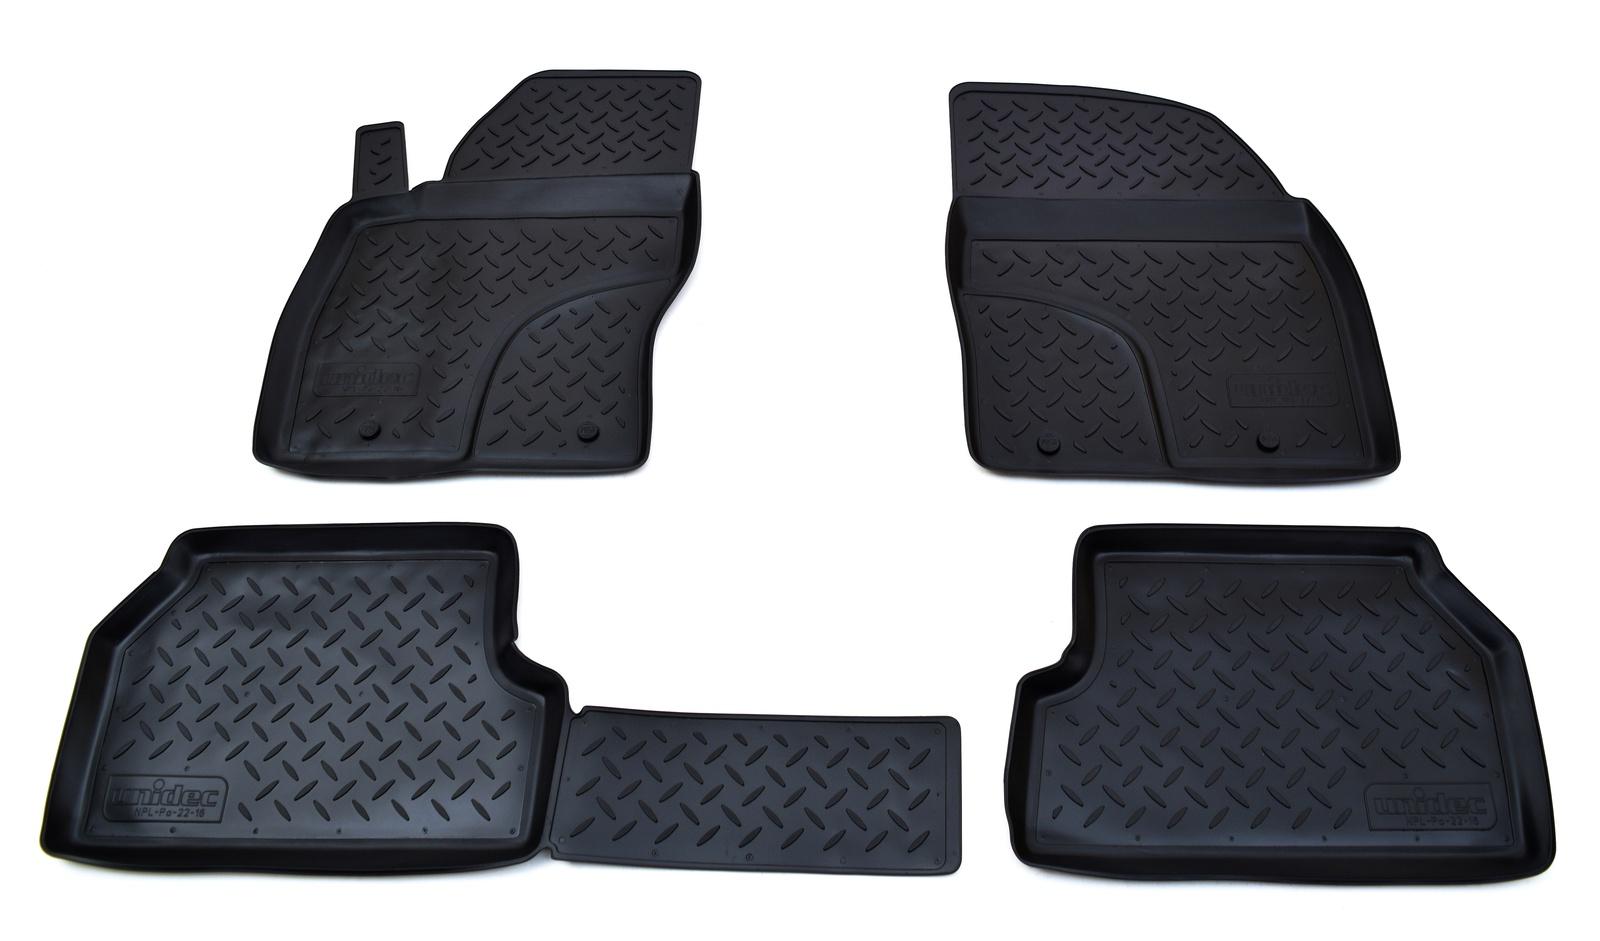 Коврики в салон Norplast для Ford Focus II 2008-2011, NPL-Po-22-16, черный renault thalia ii 2008